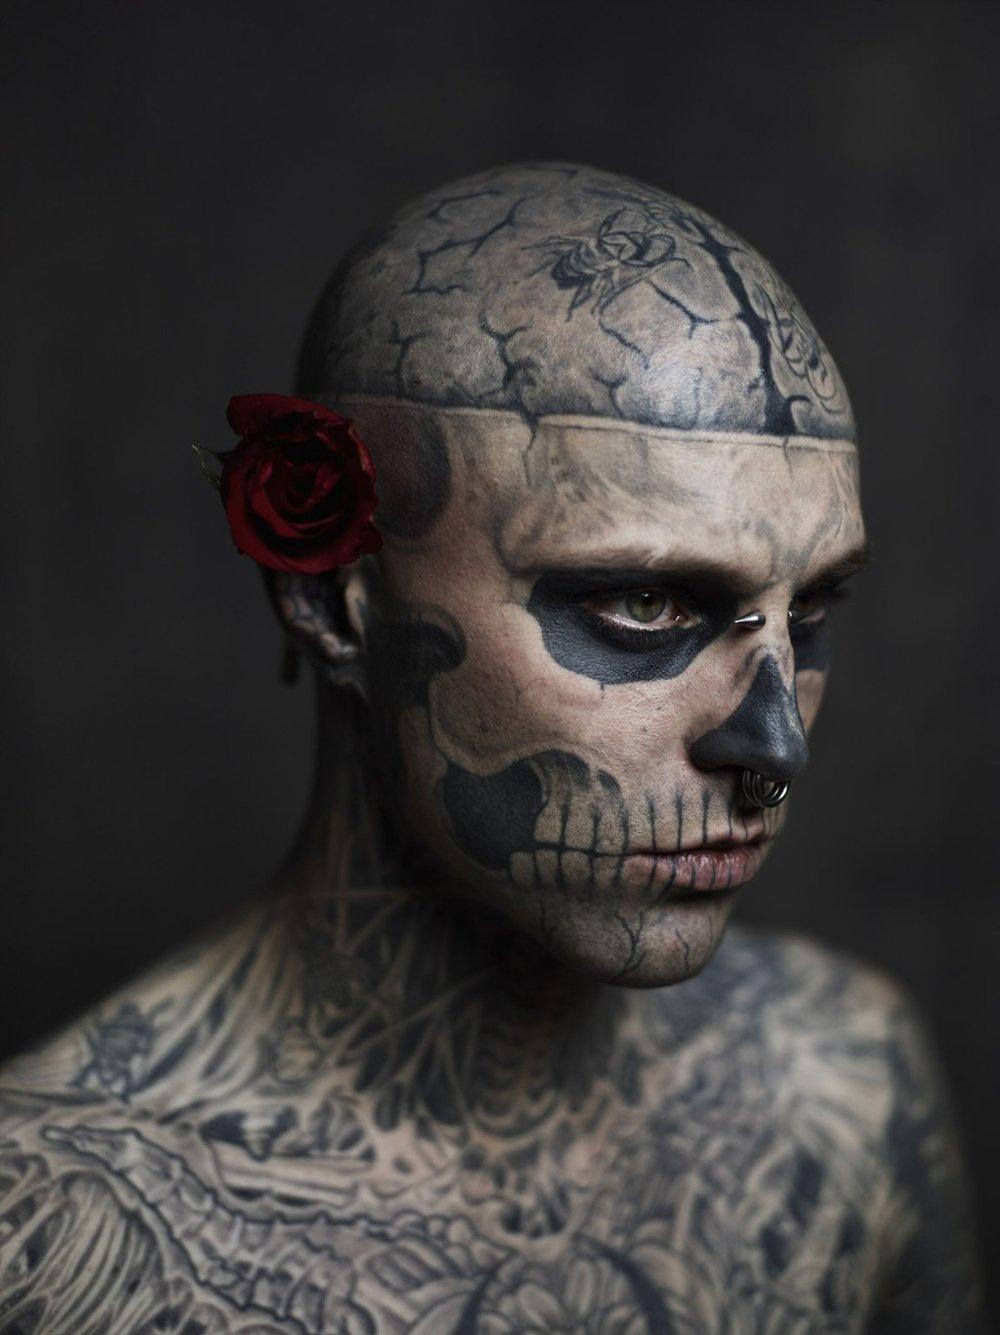 Joey_L_Photographer_Zombie_Boy_001.jpg